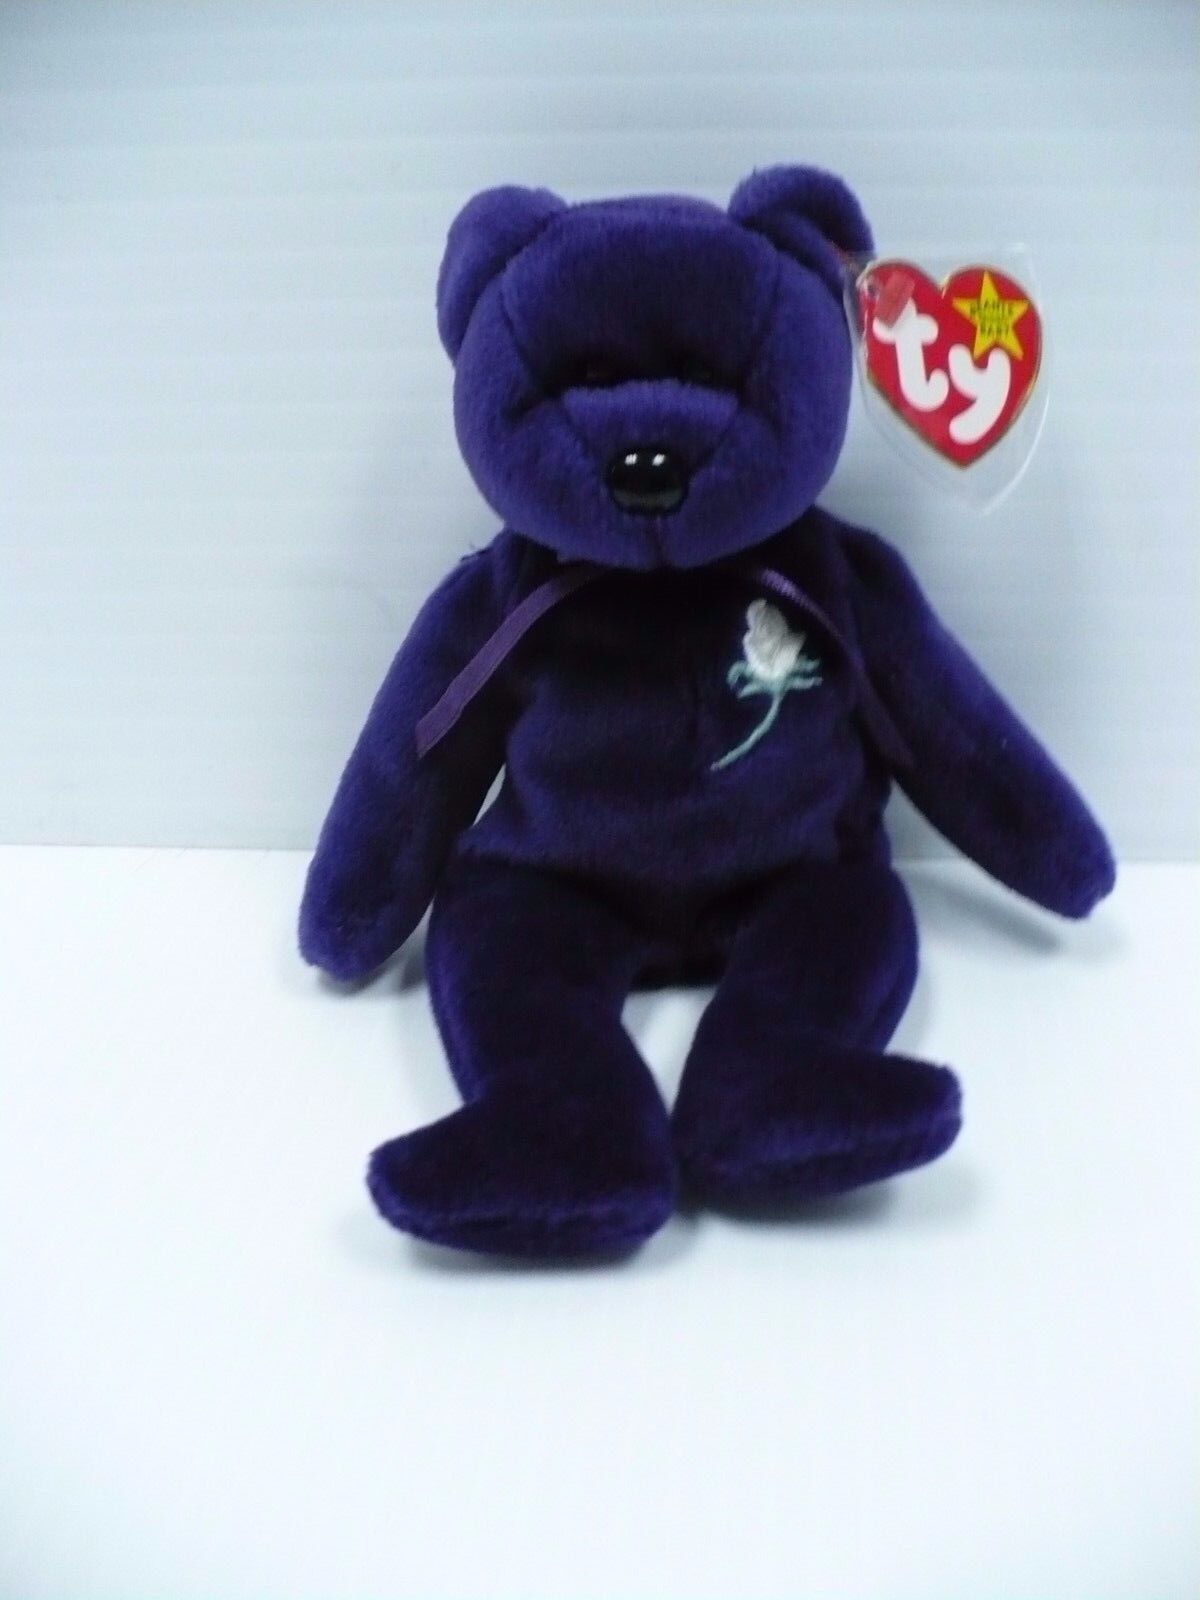 Beanie baby im ruhestand 1997 prinzessin diana beanie baby